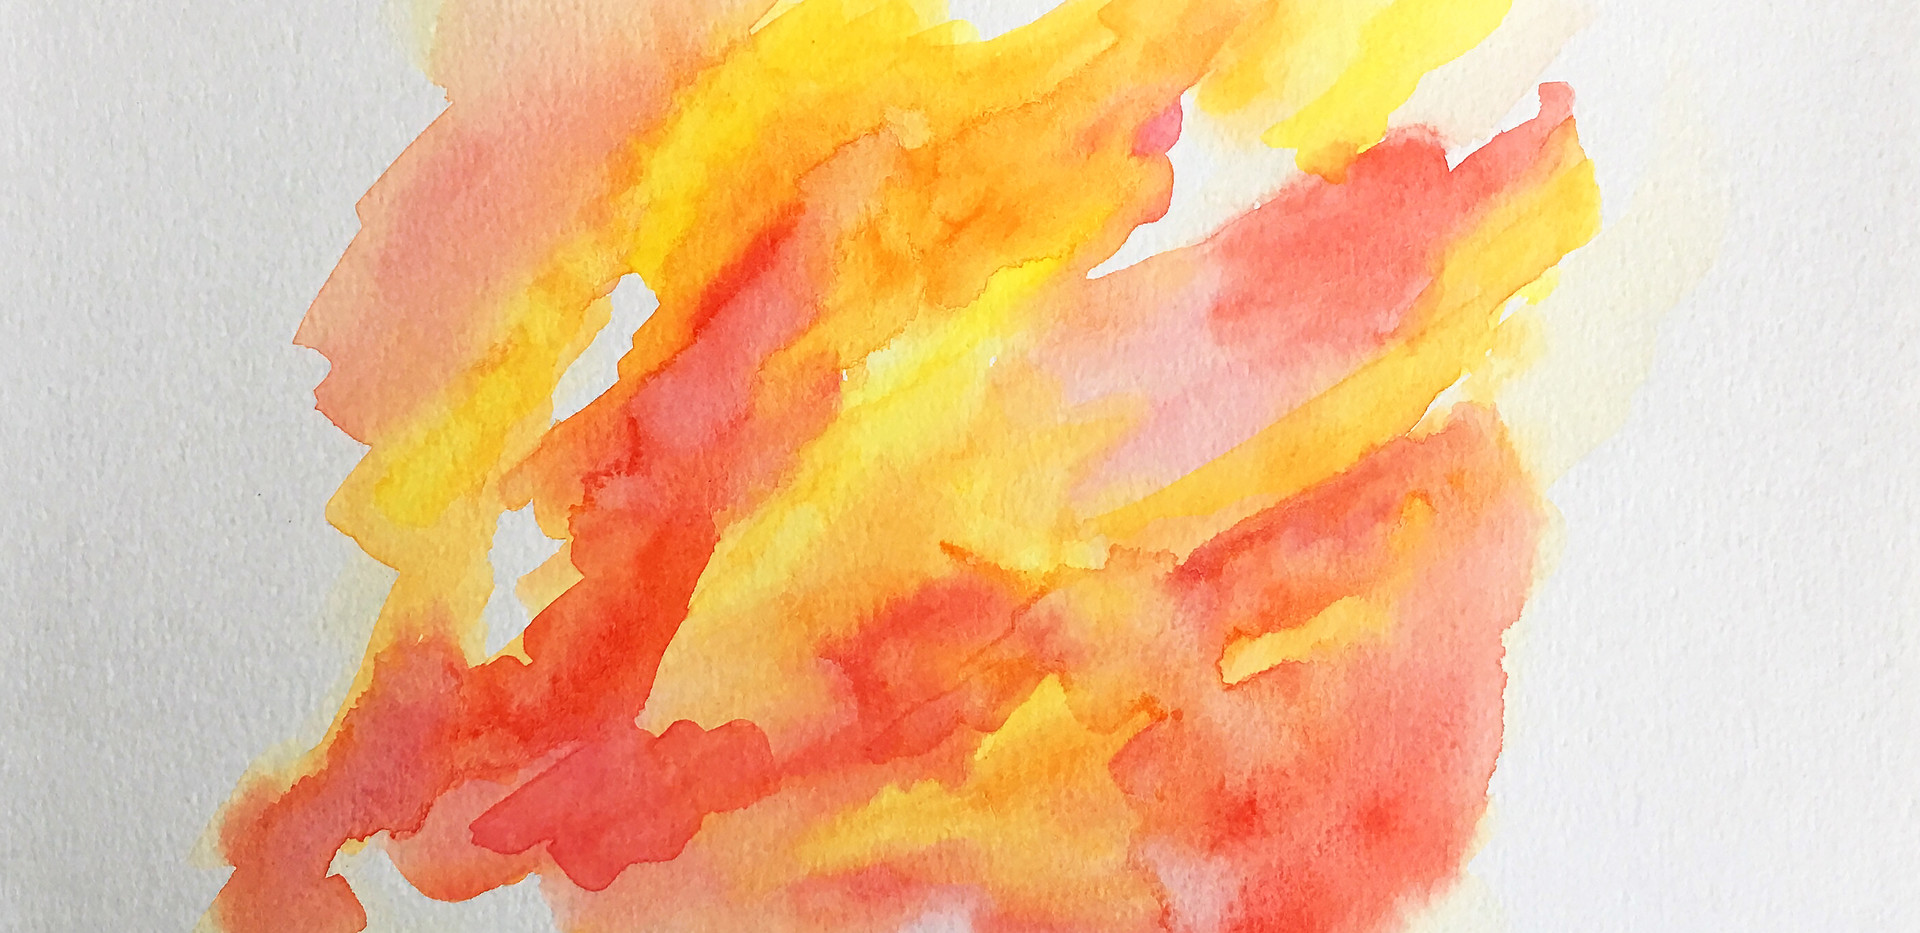 Karina Matheus - Burnt VIII (Arrival Series)